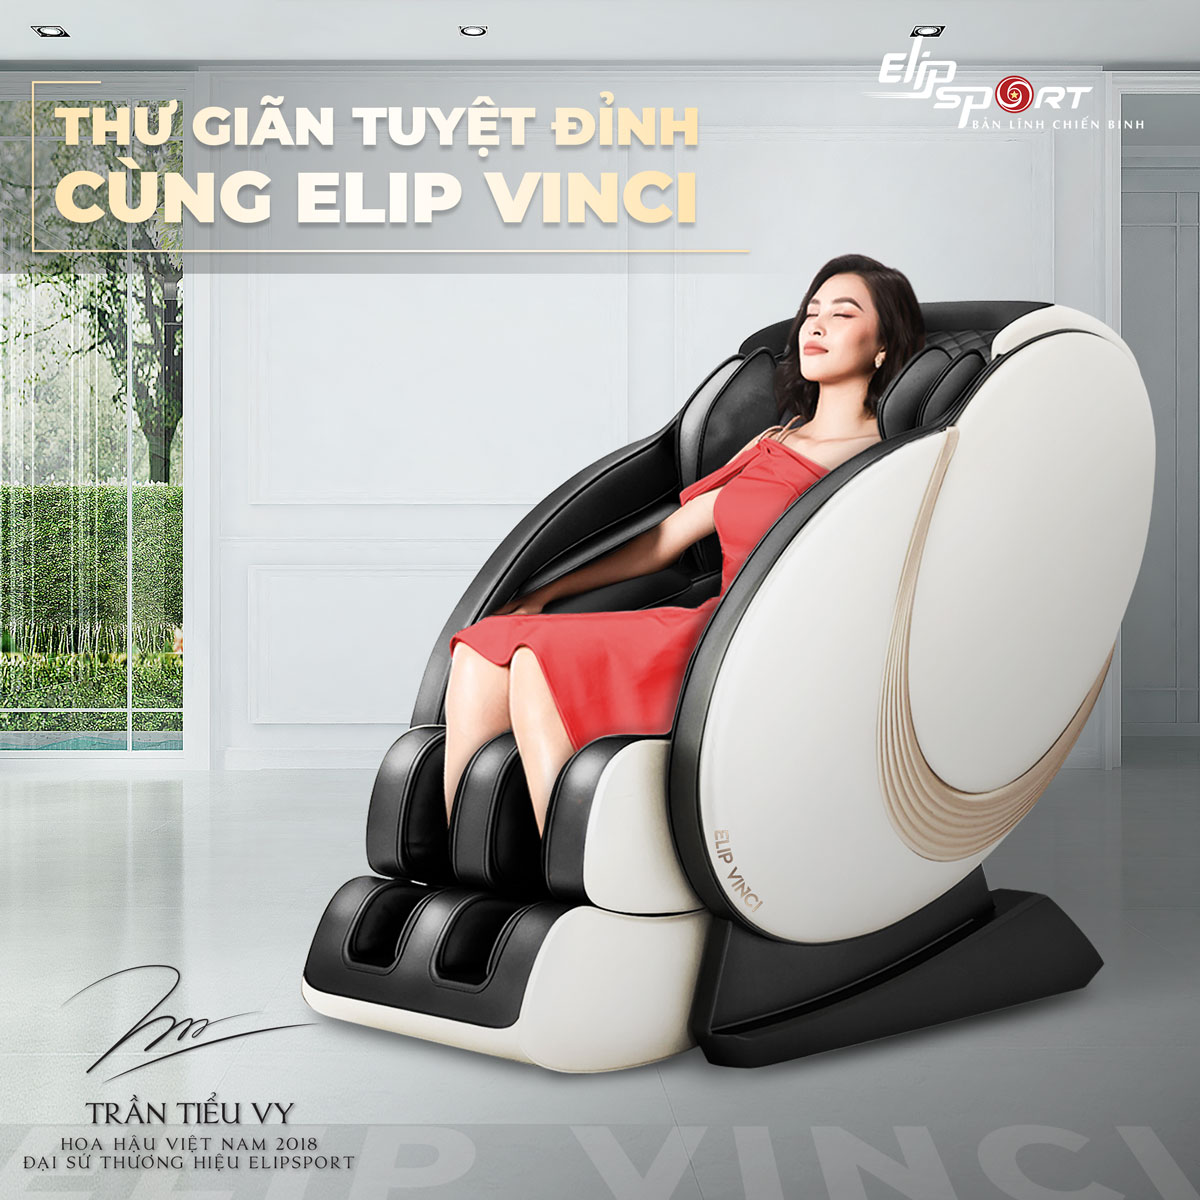 Ghế massage ELIP Vinci